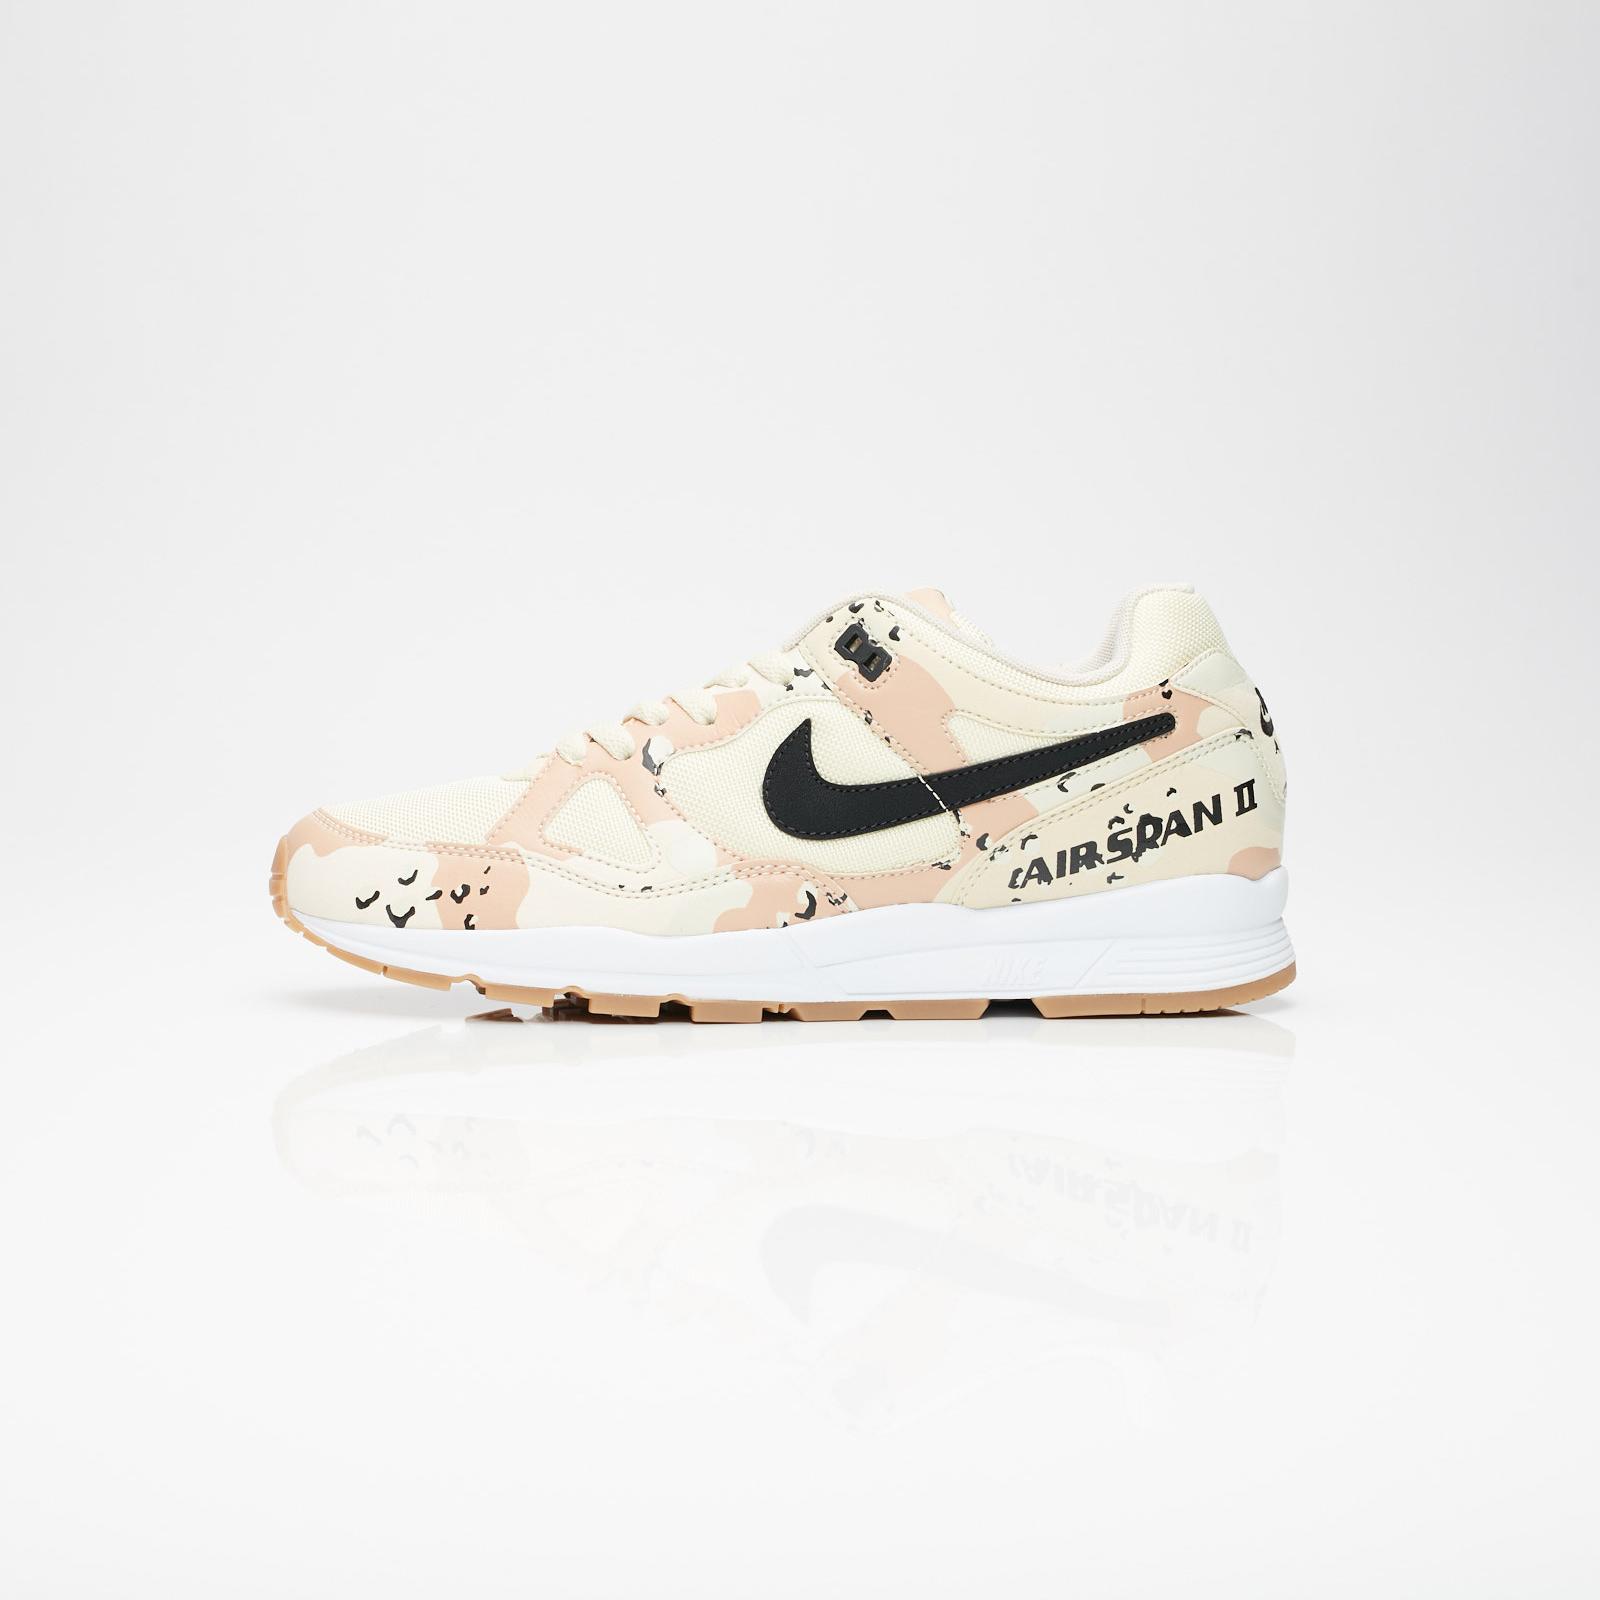 best sneakers 4f290 7d26a Nike Air Span II Prm - Ao1546-200 - Sneakersnstuff   sneakers   streetwear  online since 1999